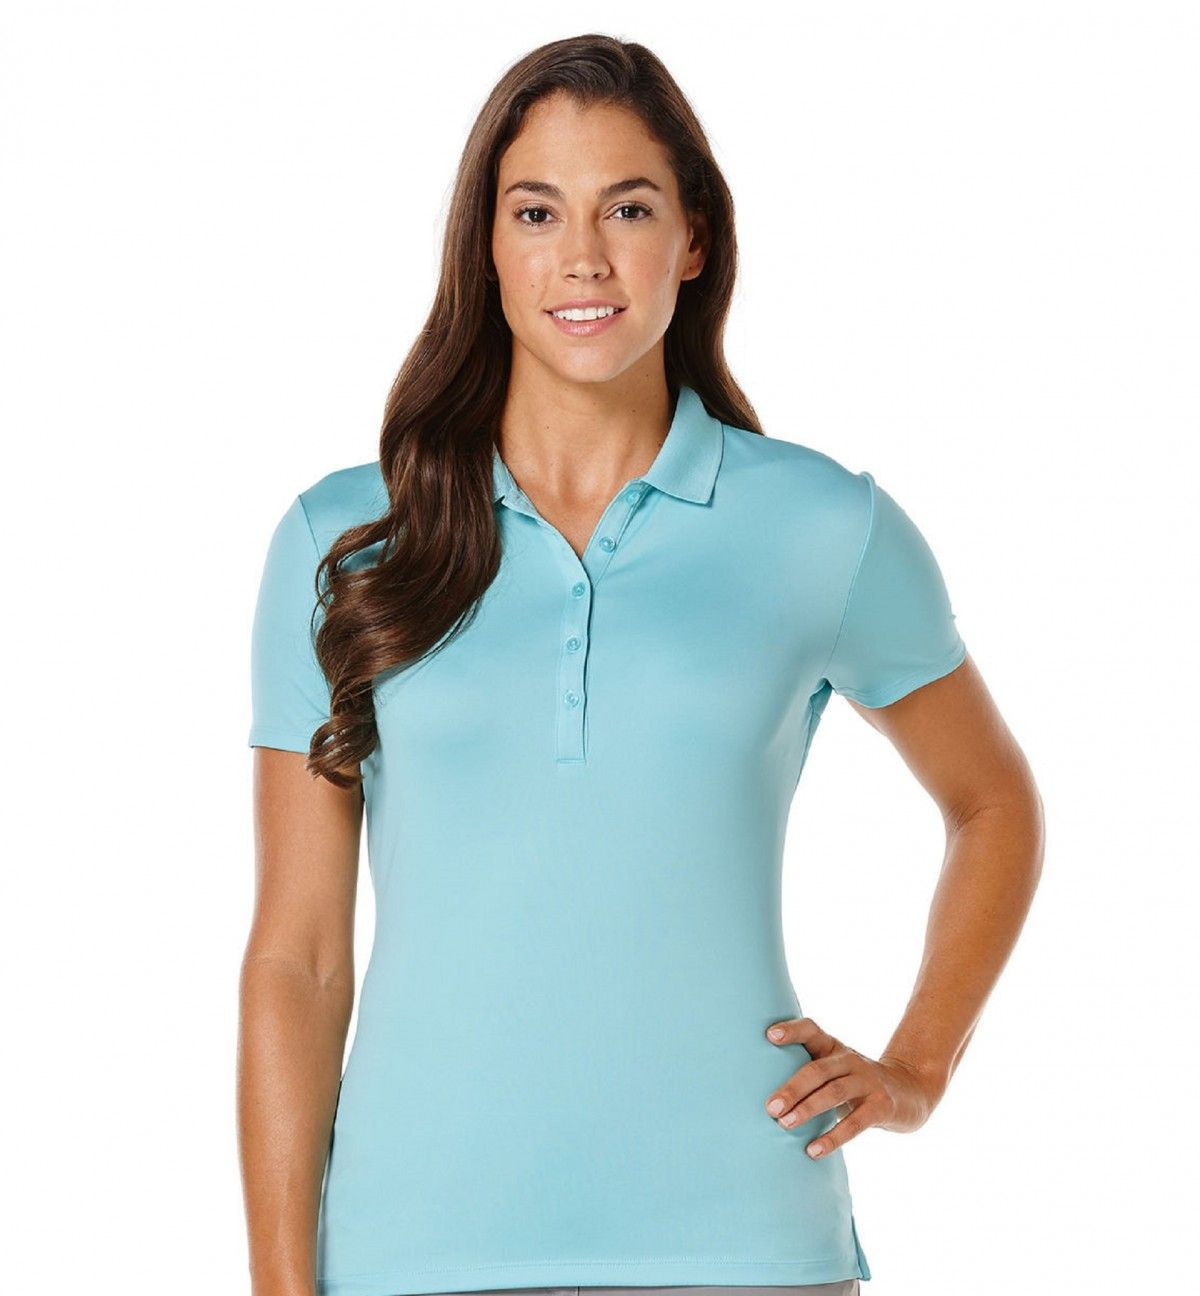 cfc4b5eb Callaway Golf Shirts Ladies « Alzheimer's Network of Oregon